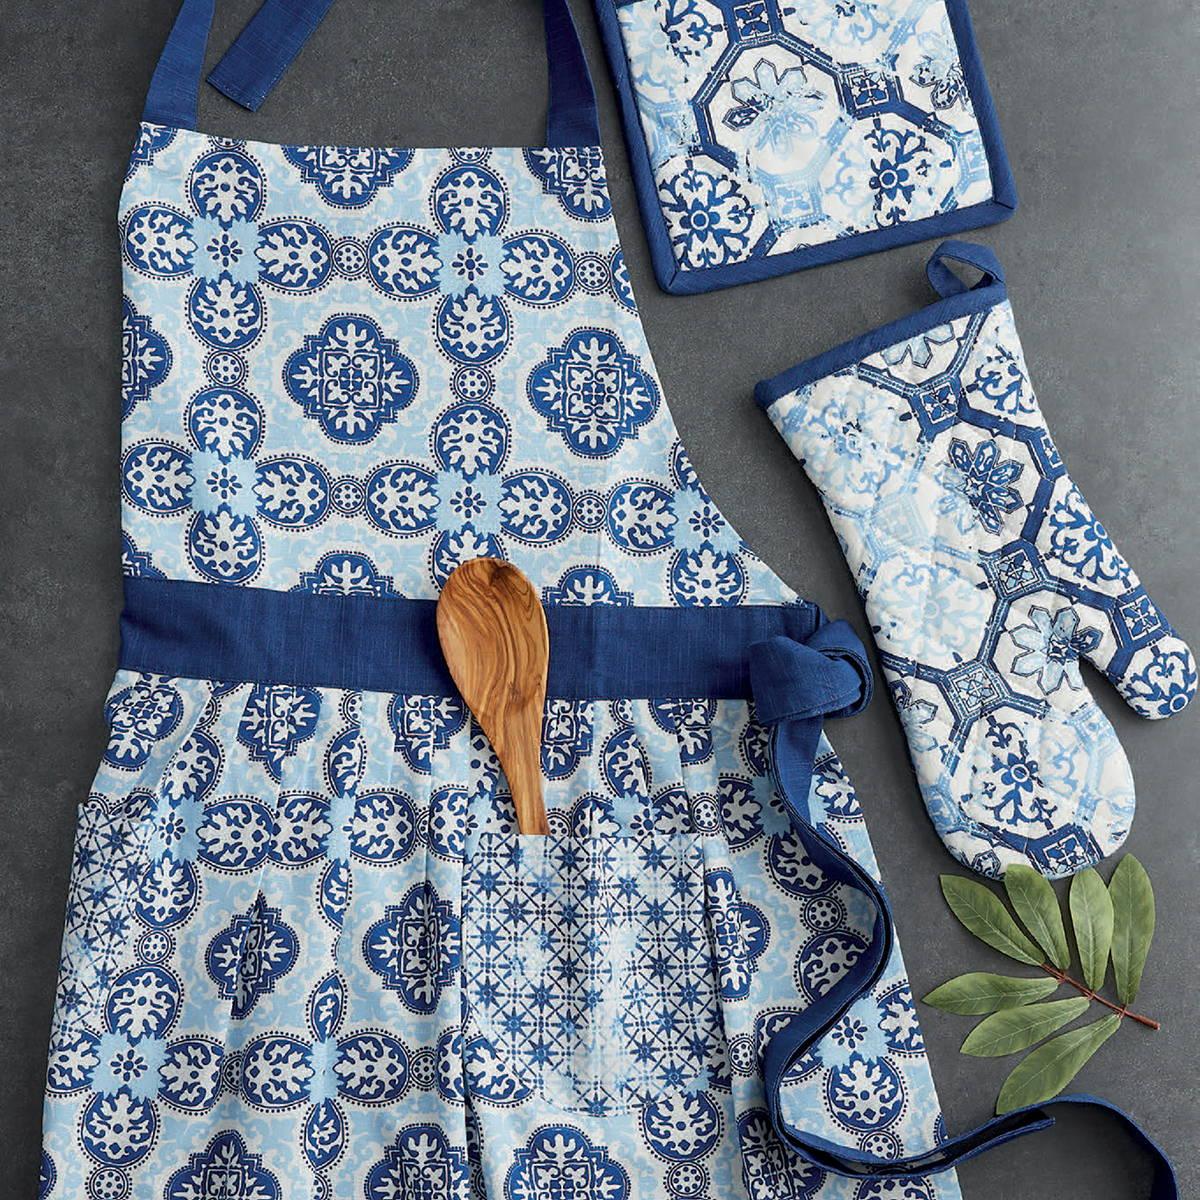 wholesale fall dishtowels for gift shops